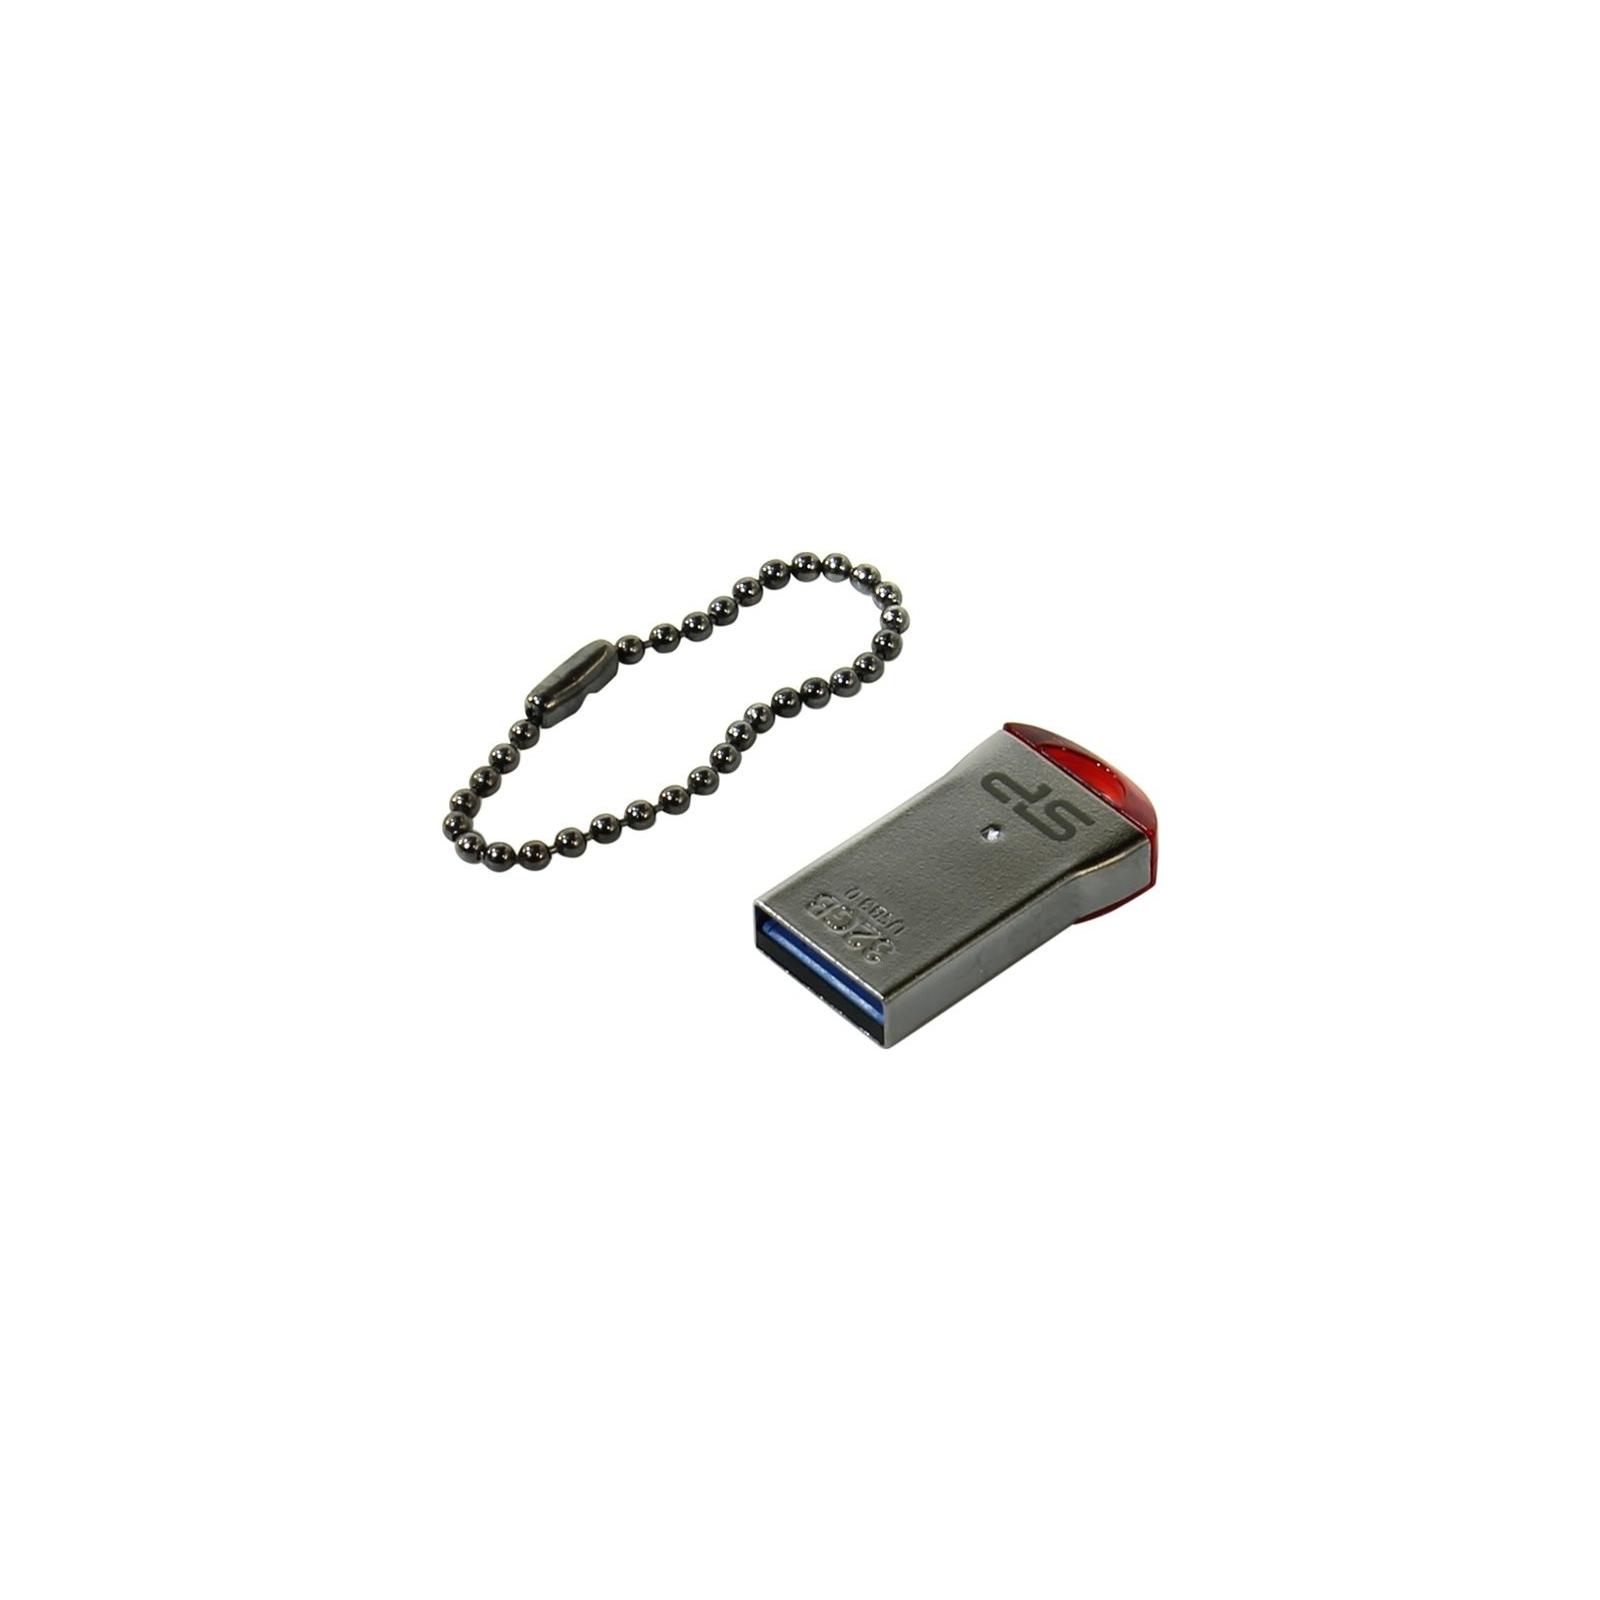 USB флеш накопитель Silicon Power 16GB JEWEL J01 RED USB 3.0 (SP016GBUF3J01V1R) изображение 2